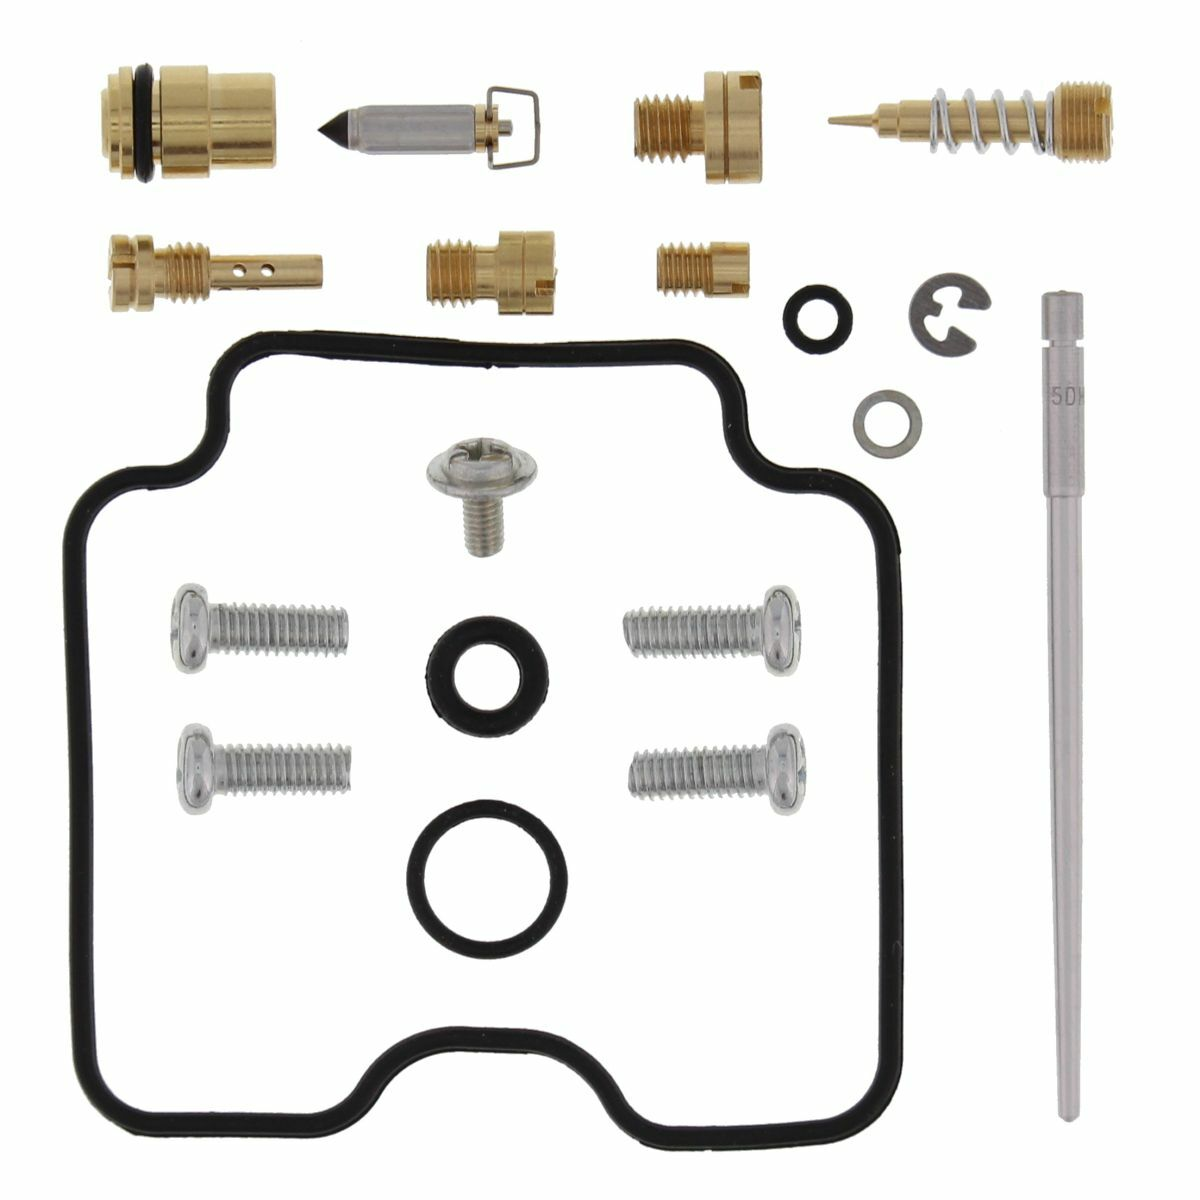 Obrázek produktu Carburetor Rebuild Kit All Balls Racing 26-1101